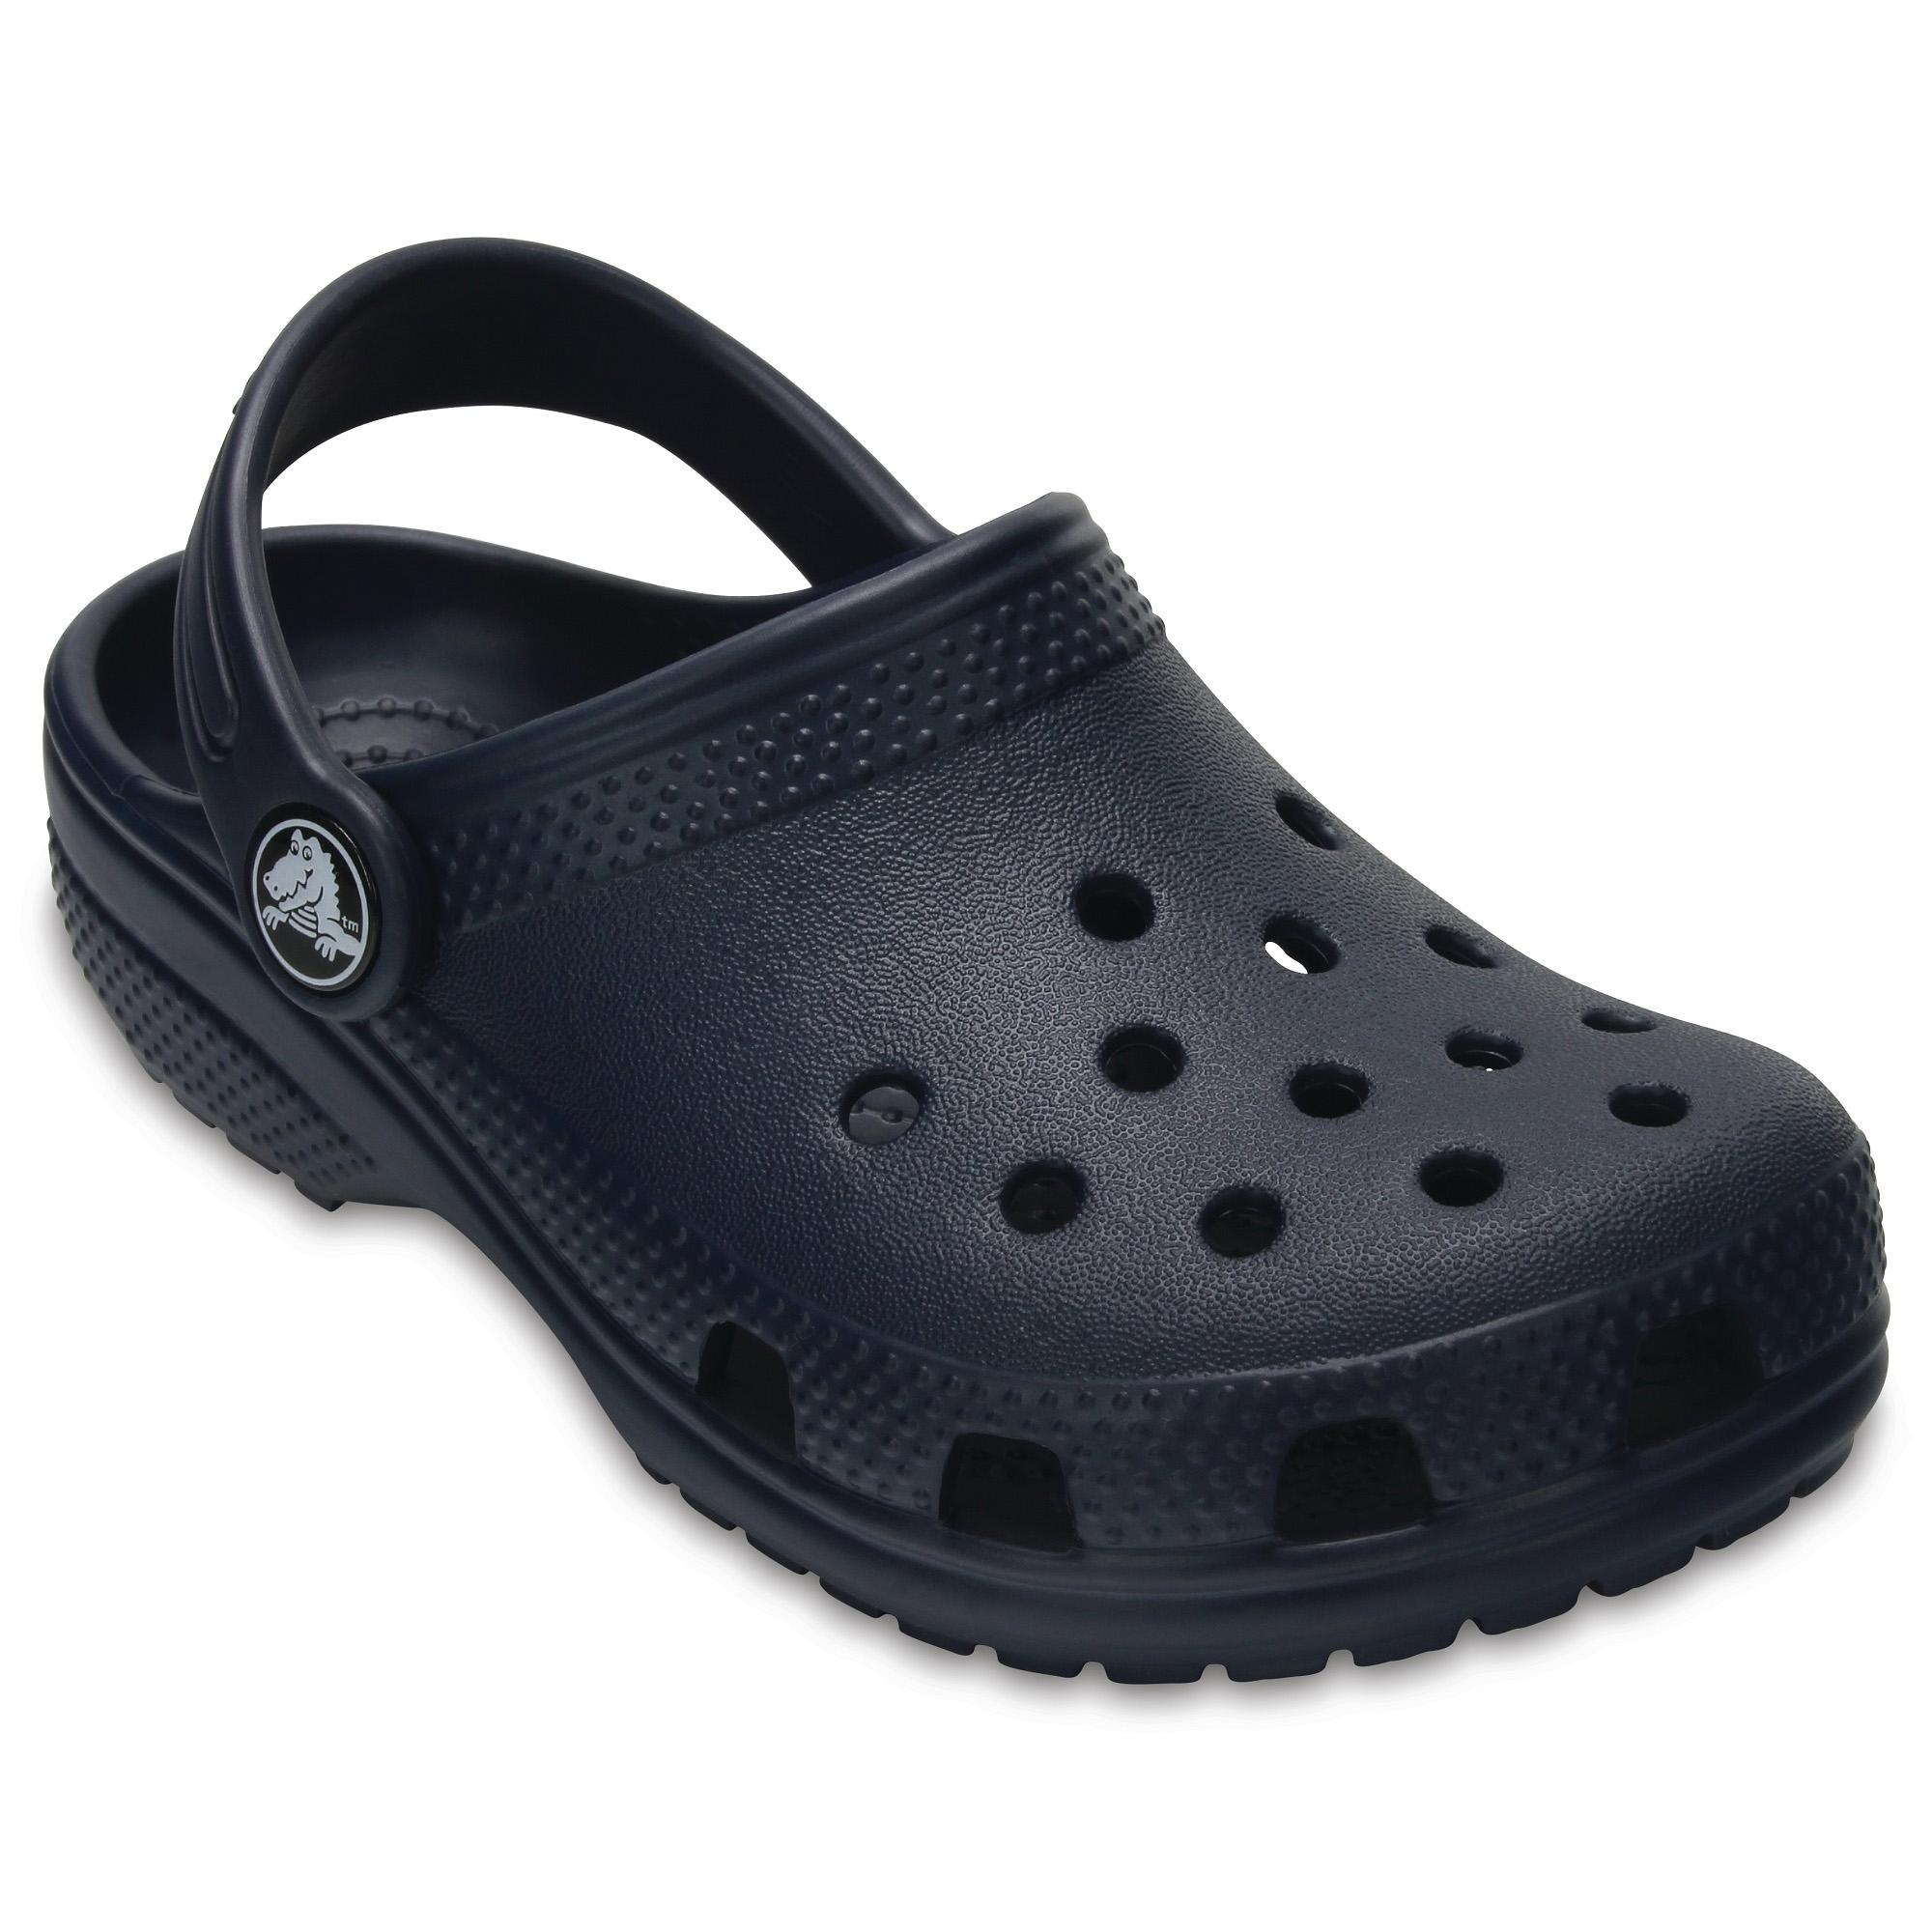 crocs shoes lazada ph flops flip philippines flats sandals flat slides slip